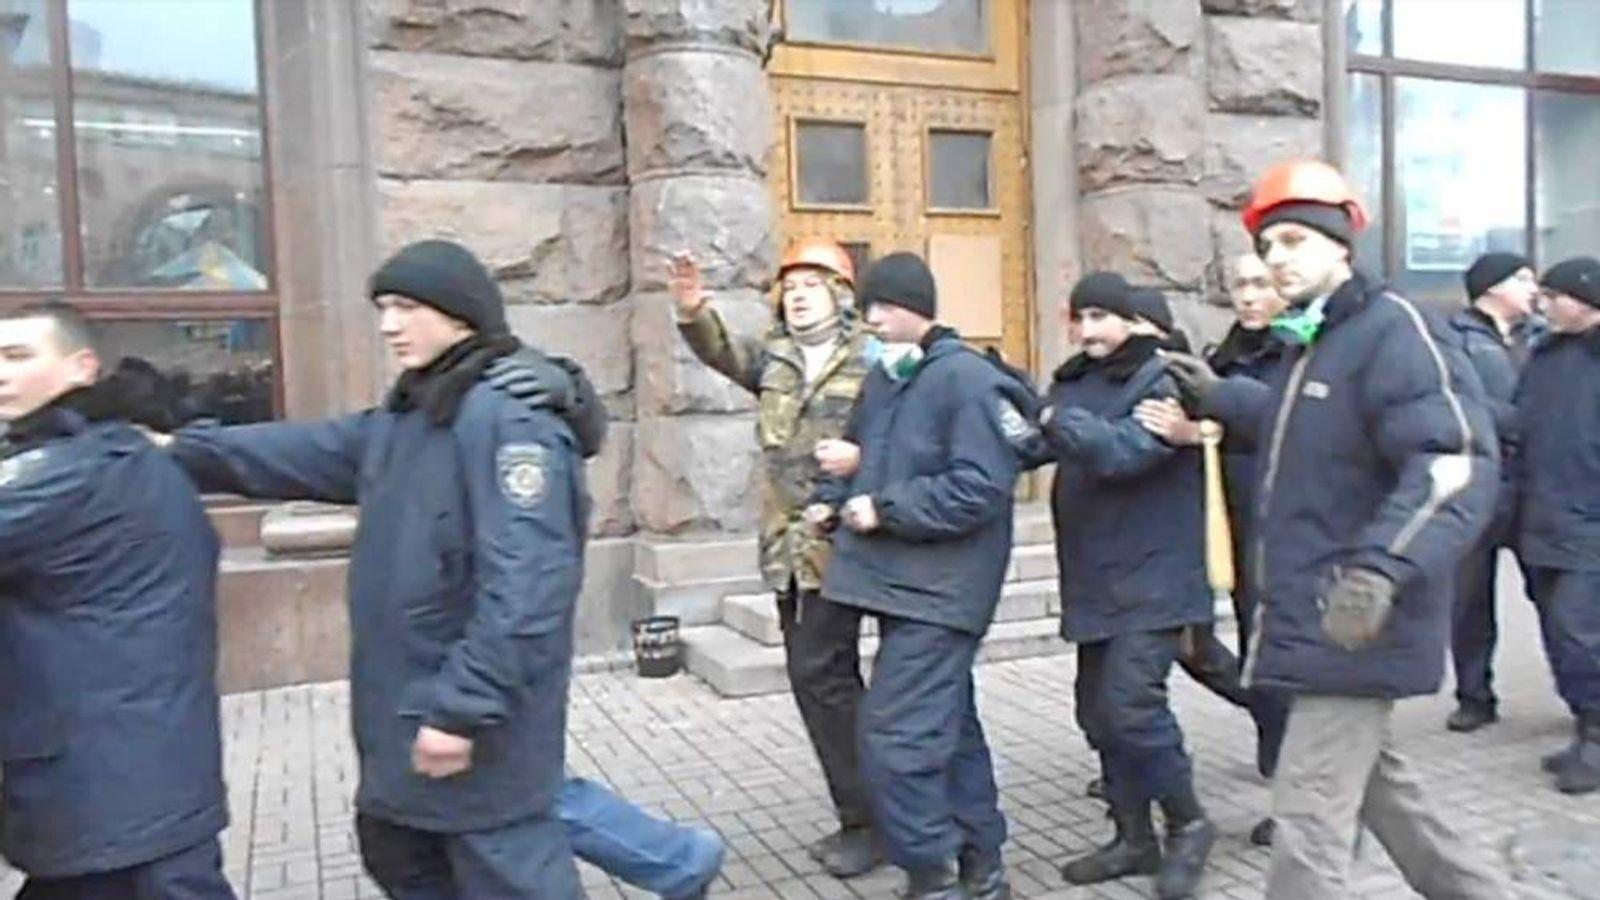 Ukraine police detained